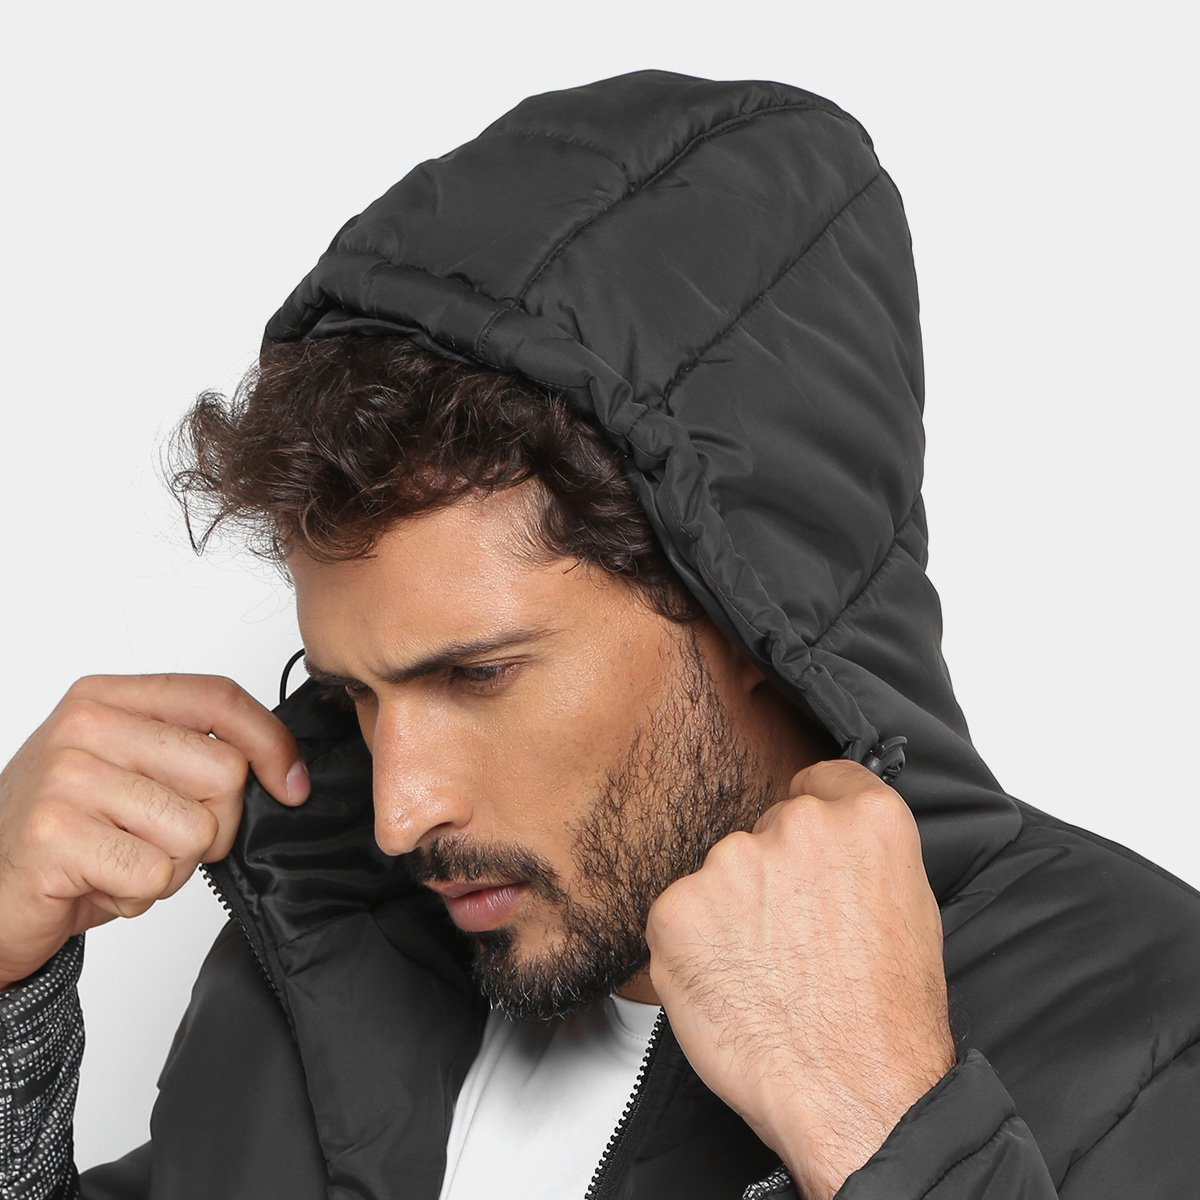 Jaqueta Gonew Nylon Estampada Capuz Masculina - Preto - Compre Agora ... 9a29f87f1a723